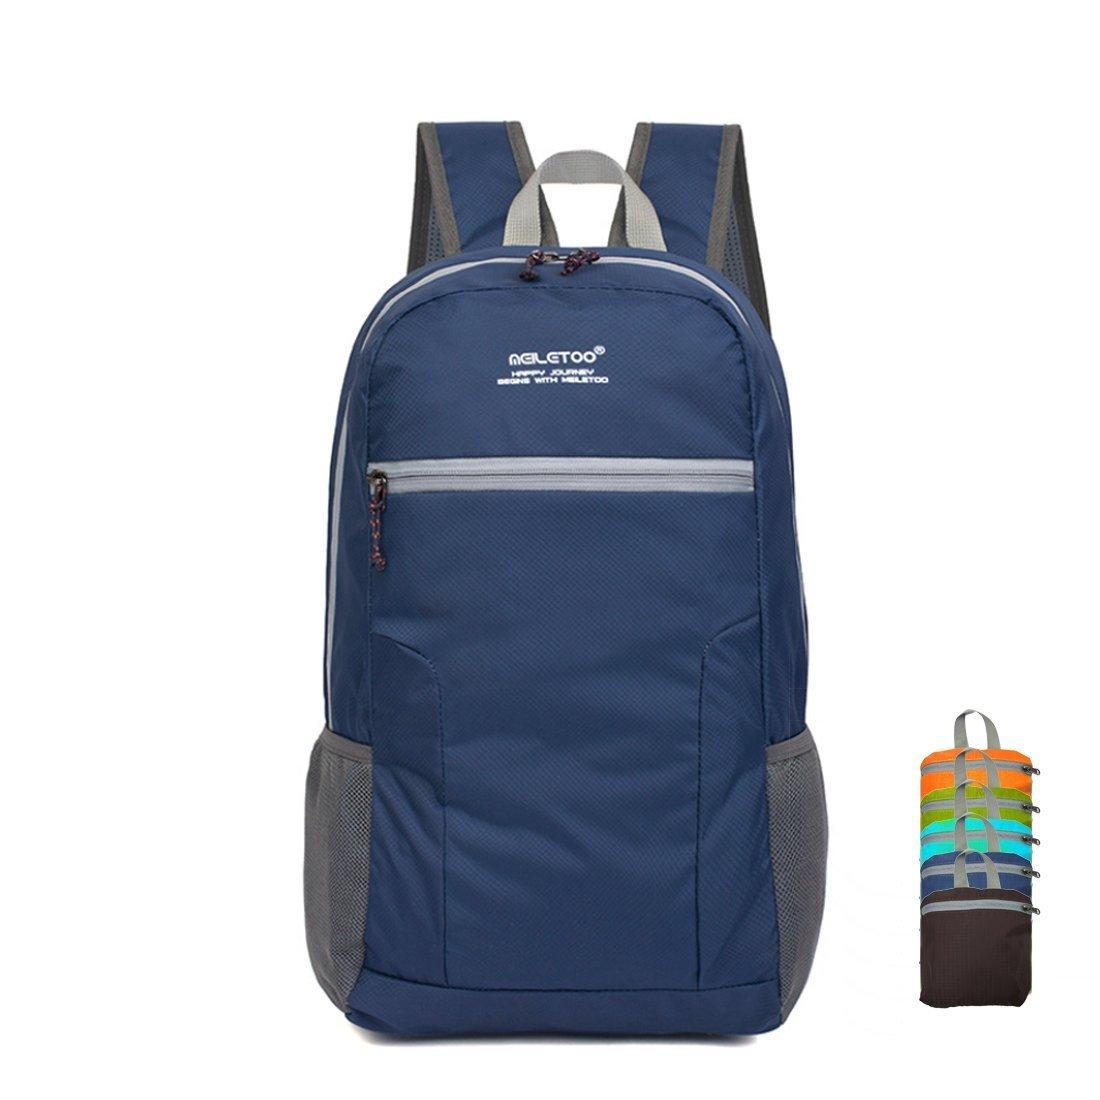 Bagspert Ultralight Foldable Multipurpose Backpack with Water Proof Rain Cover (Navy Blue)